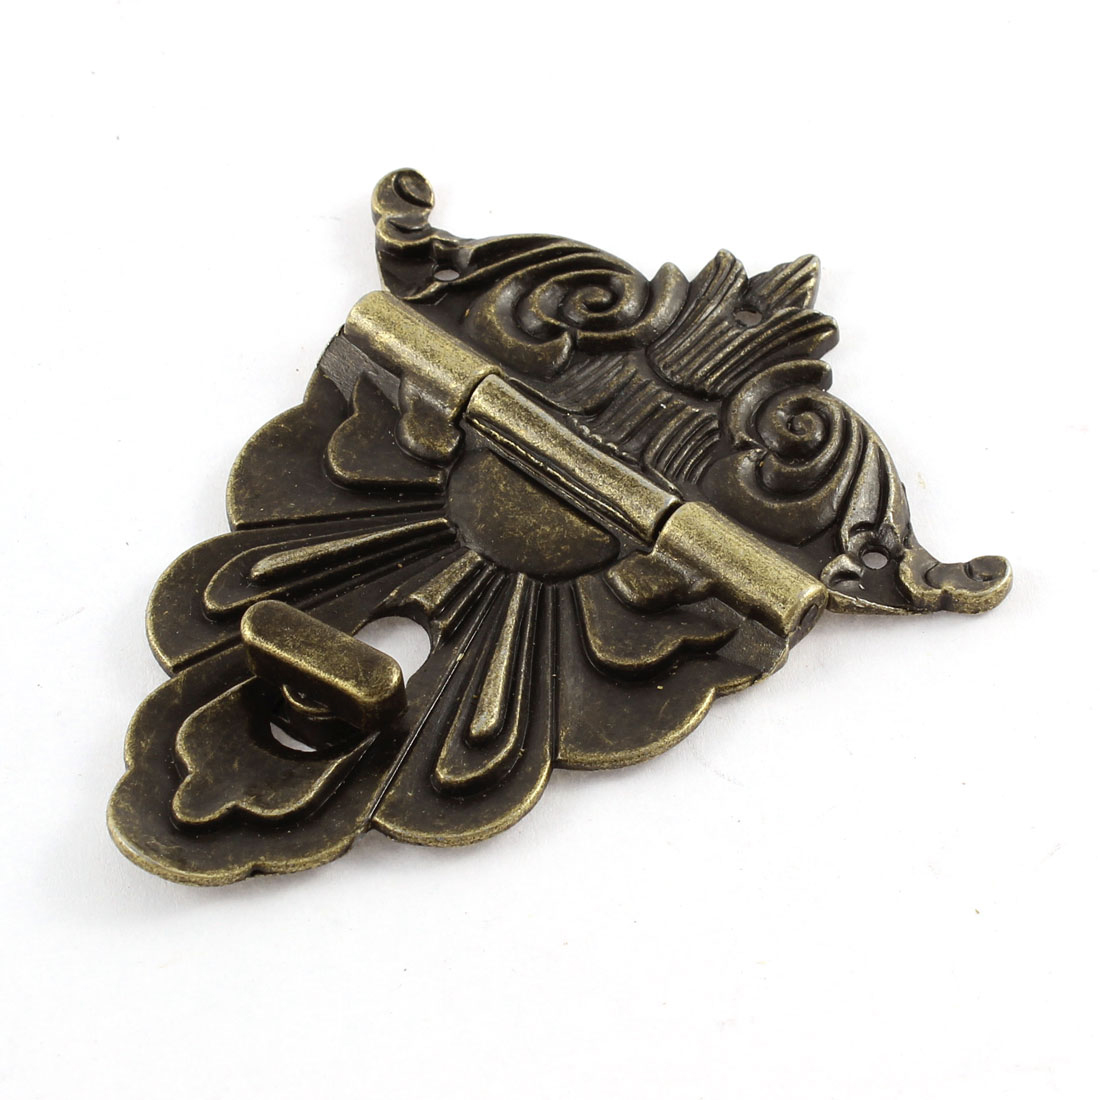 100mmx80mm Retro Style Bronze Tone Jewelry Box Drawer Decorative Hasp Lock Latch